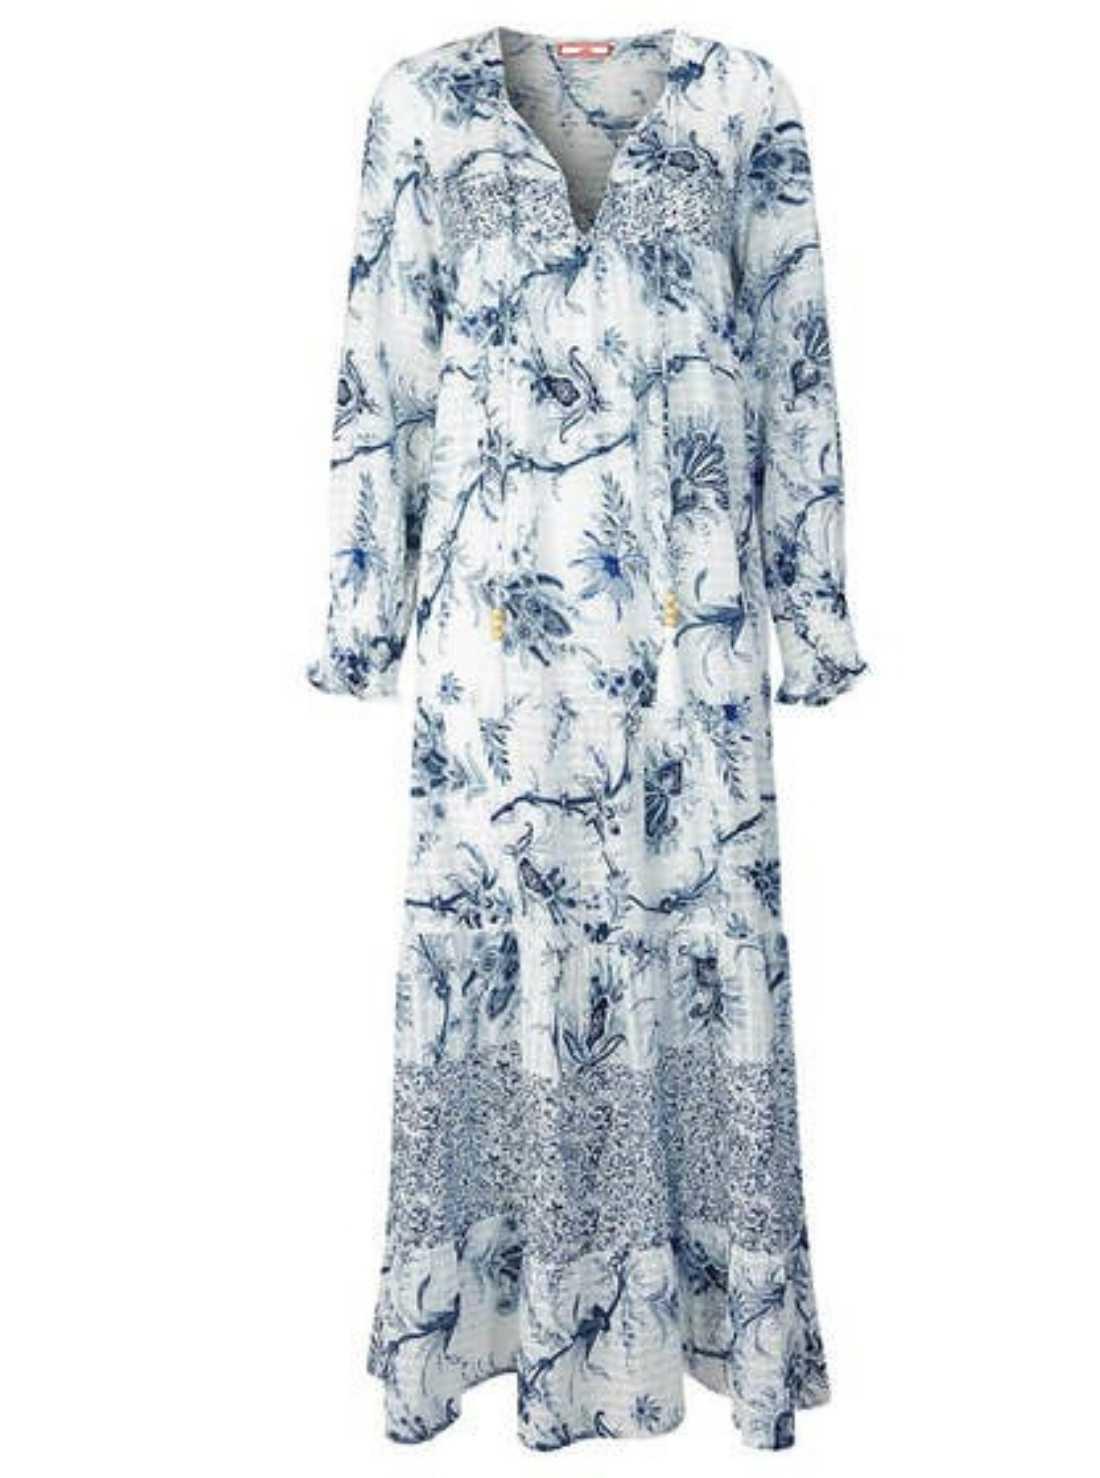 Beachy boho maxi dress